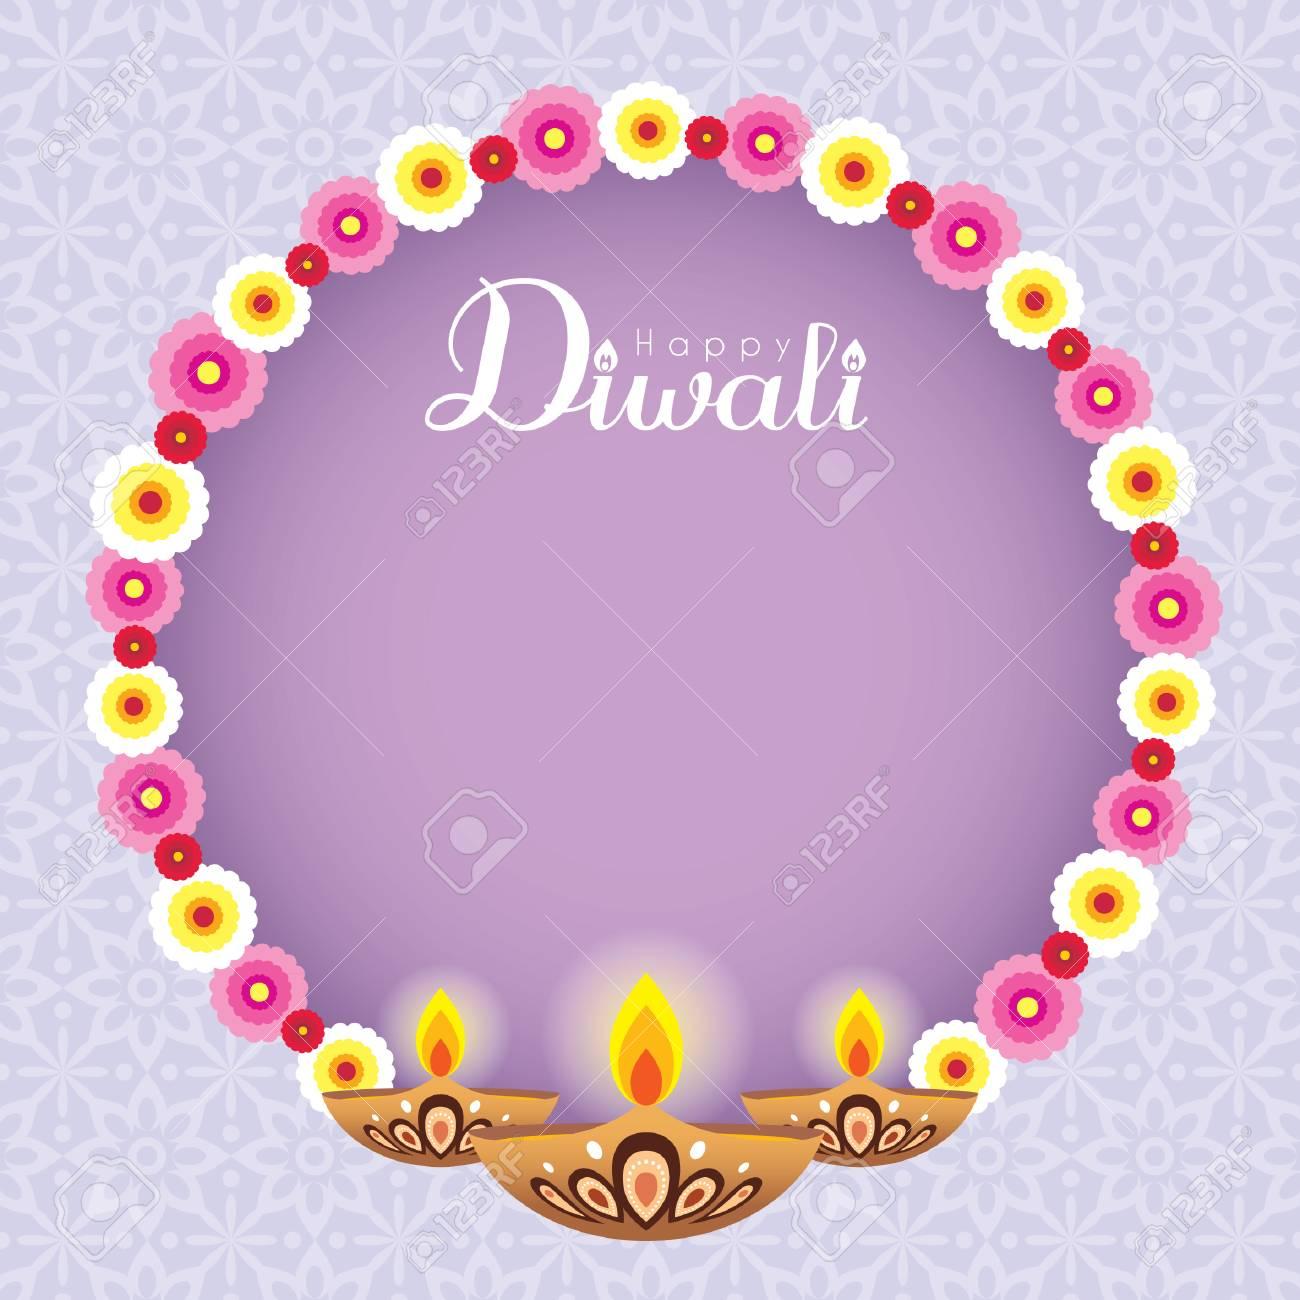 Diwali Or Deepavali Greeting Card With Beautiful Floral Wreath